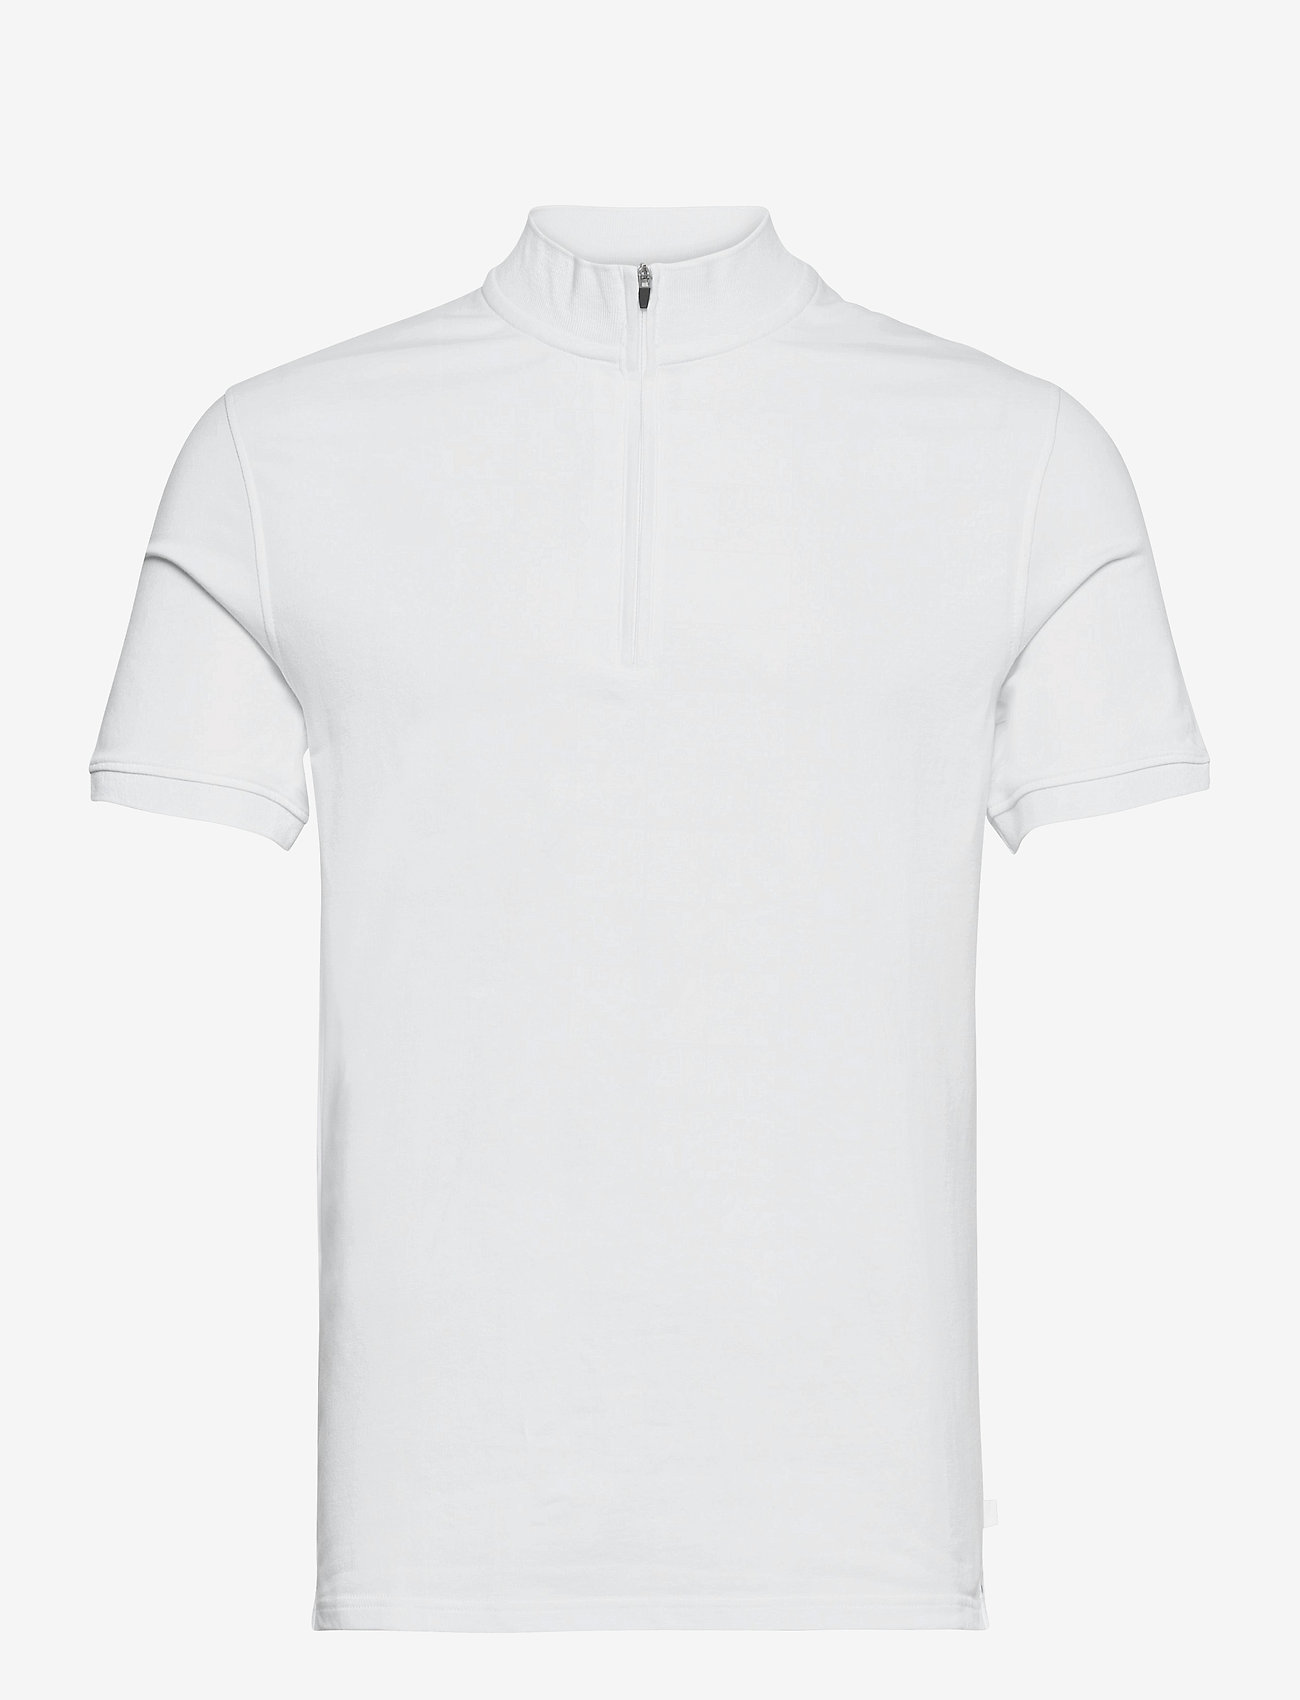 J. Lindeberg - Steel Half Zip Polo Shirt - kurzärmelig - white - 0